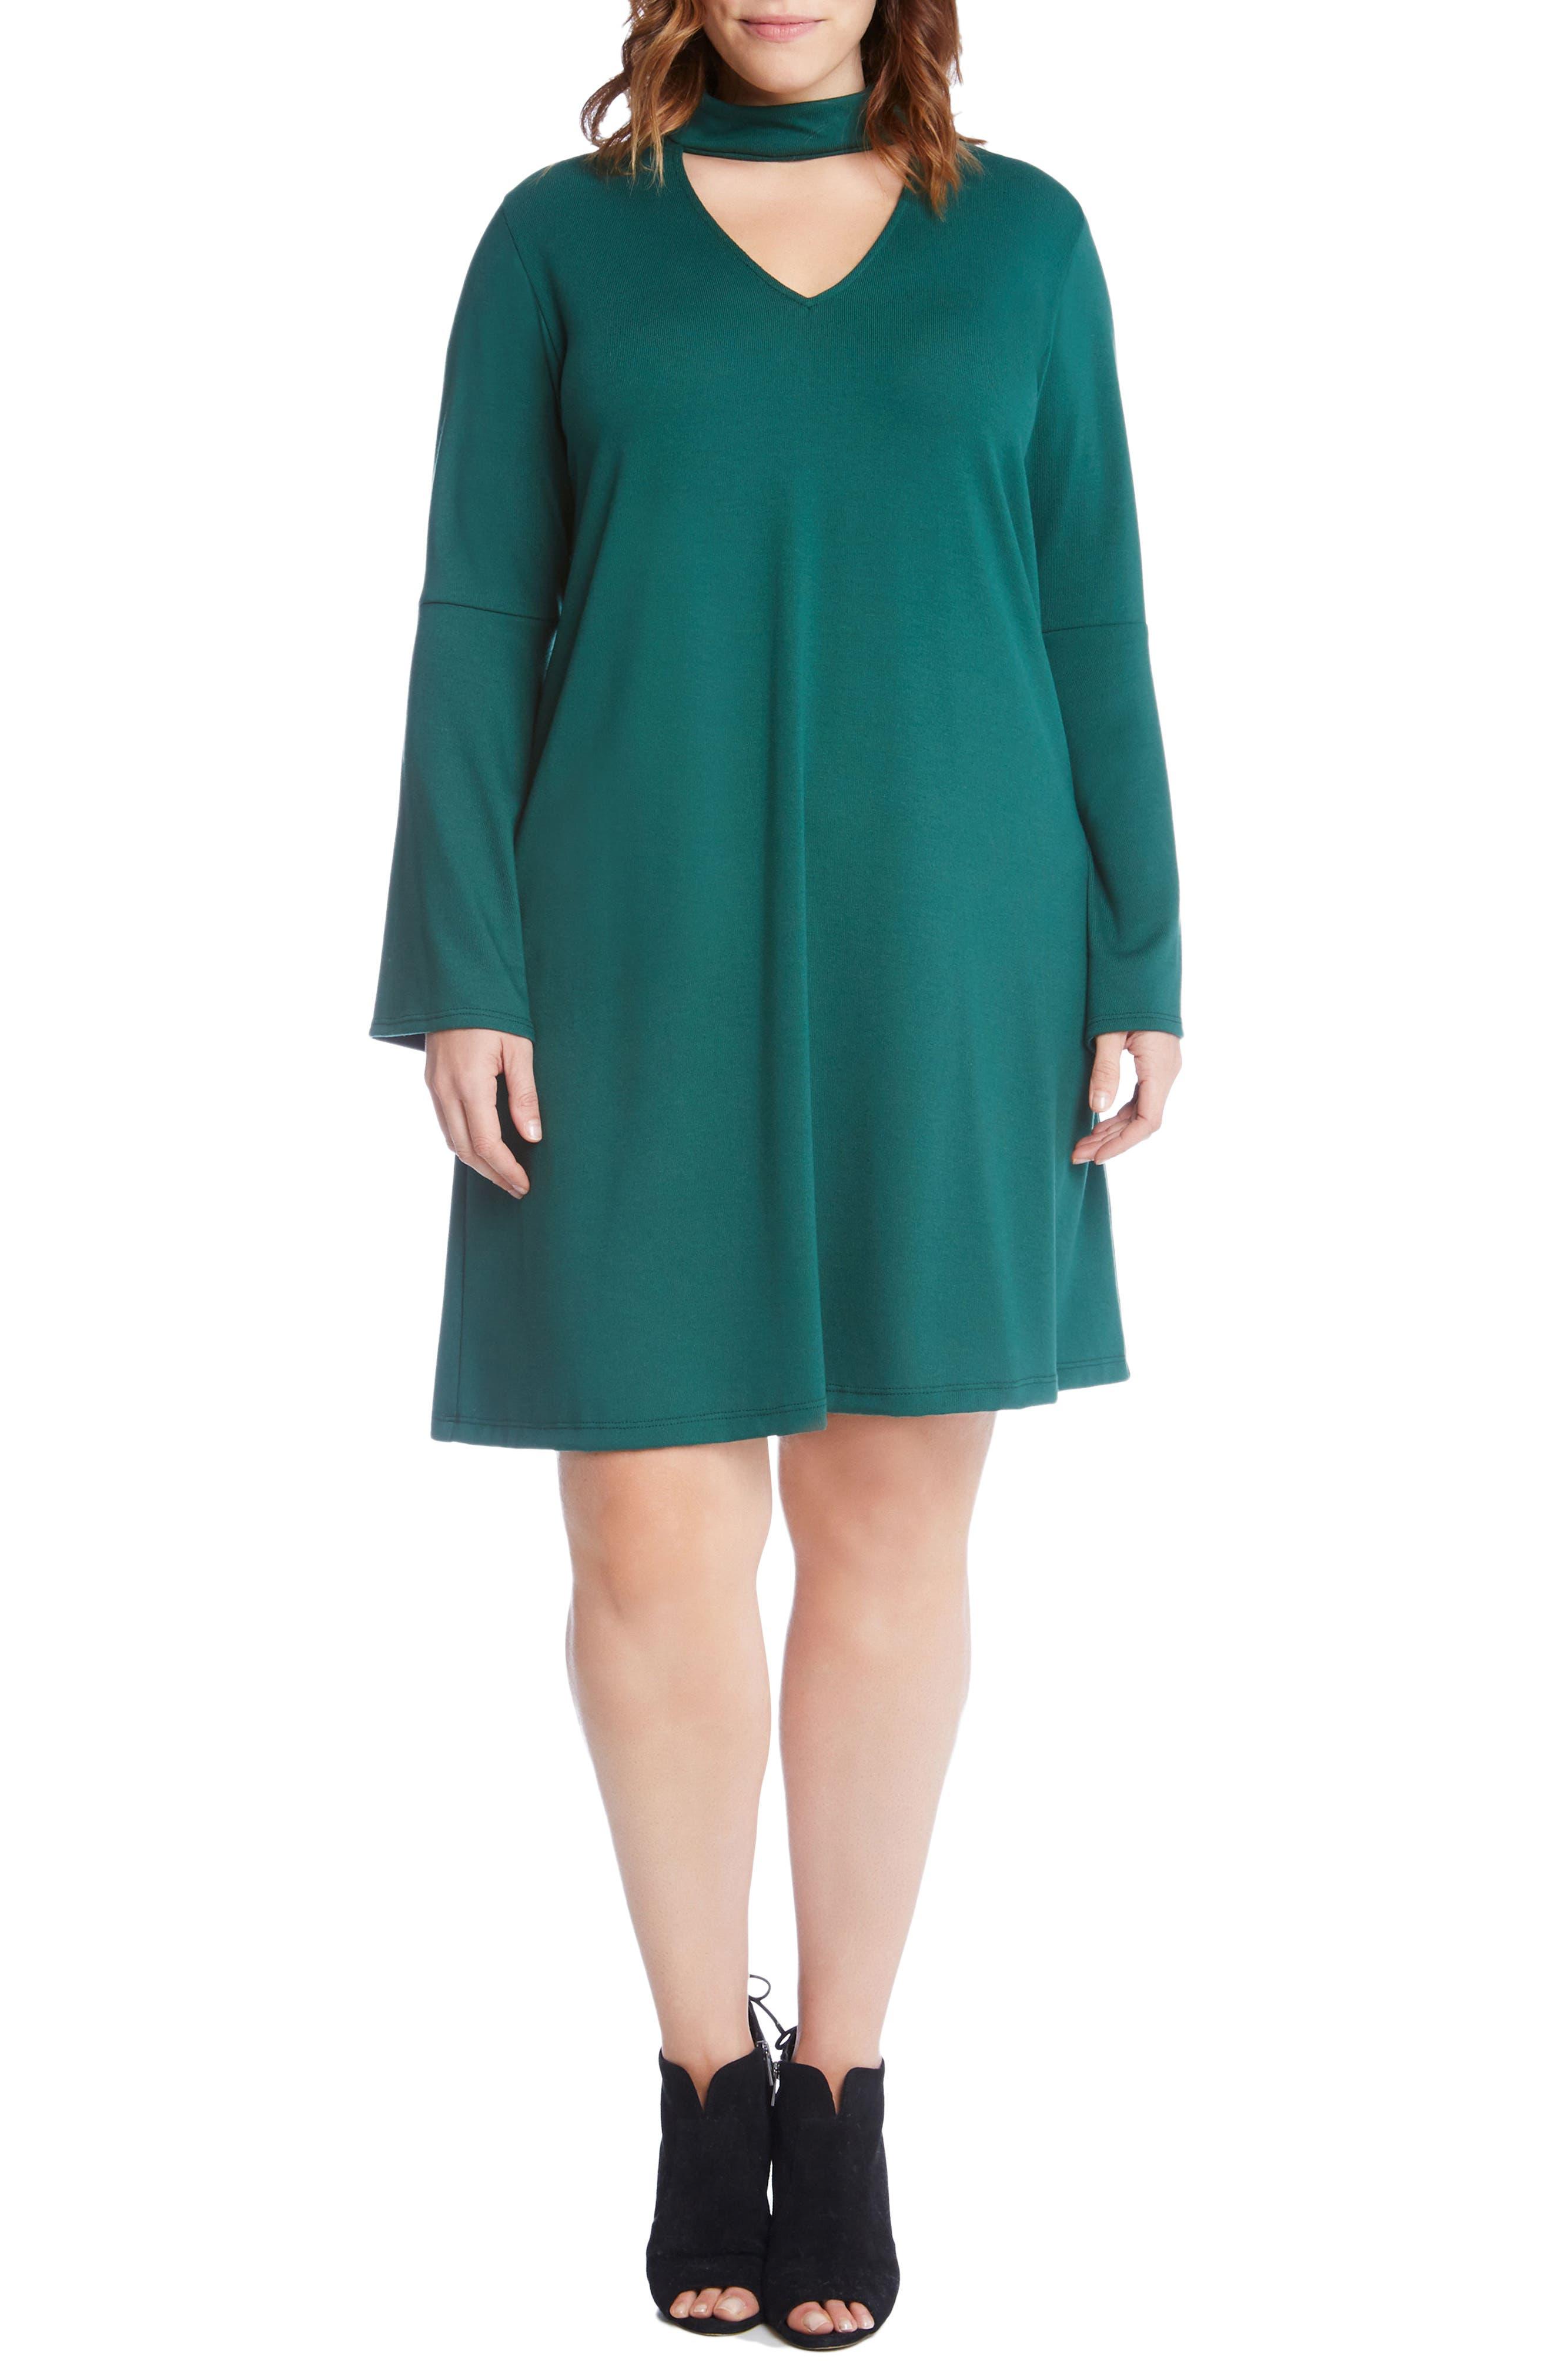 Main Image - Karen Kane Taylor Choker Neck A-Line Dress (Plus Size)